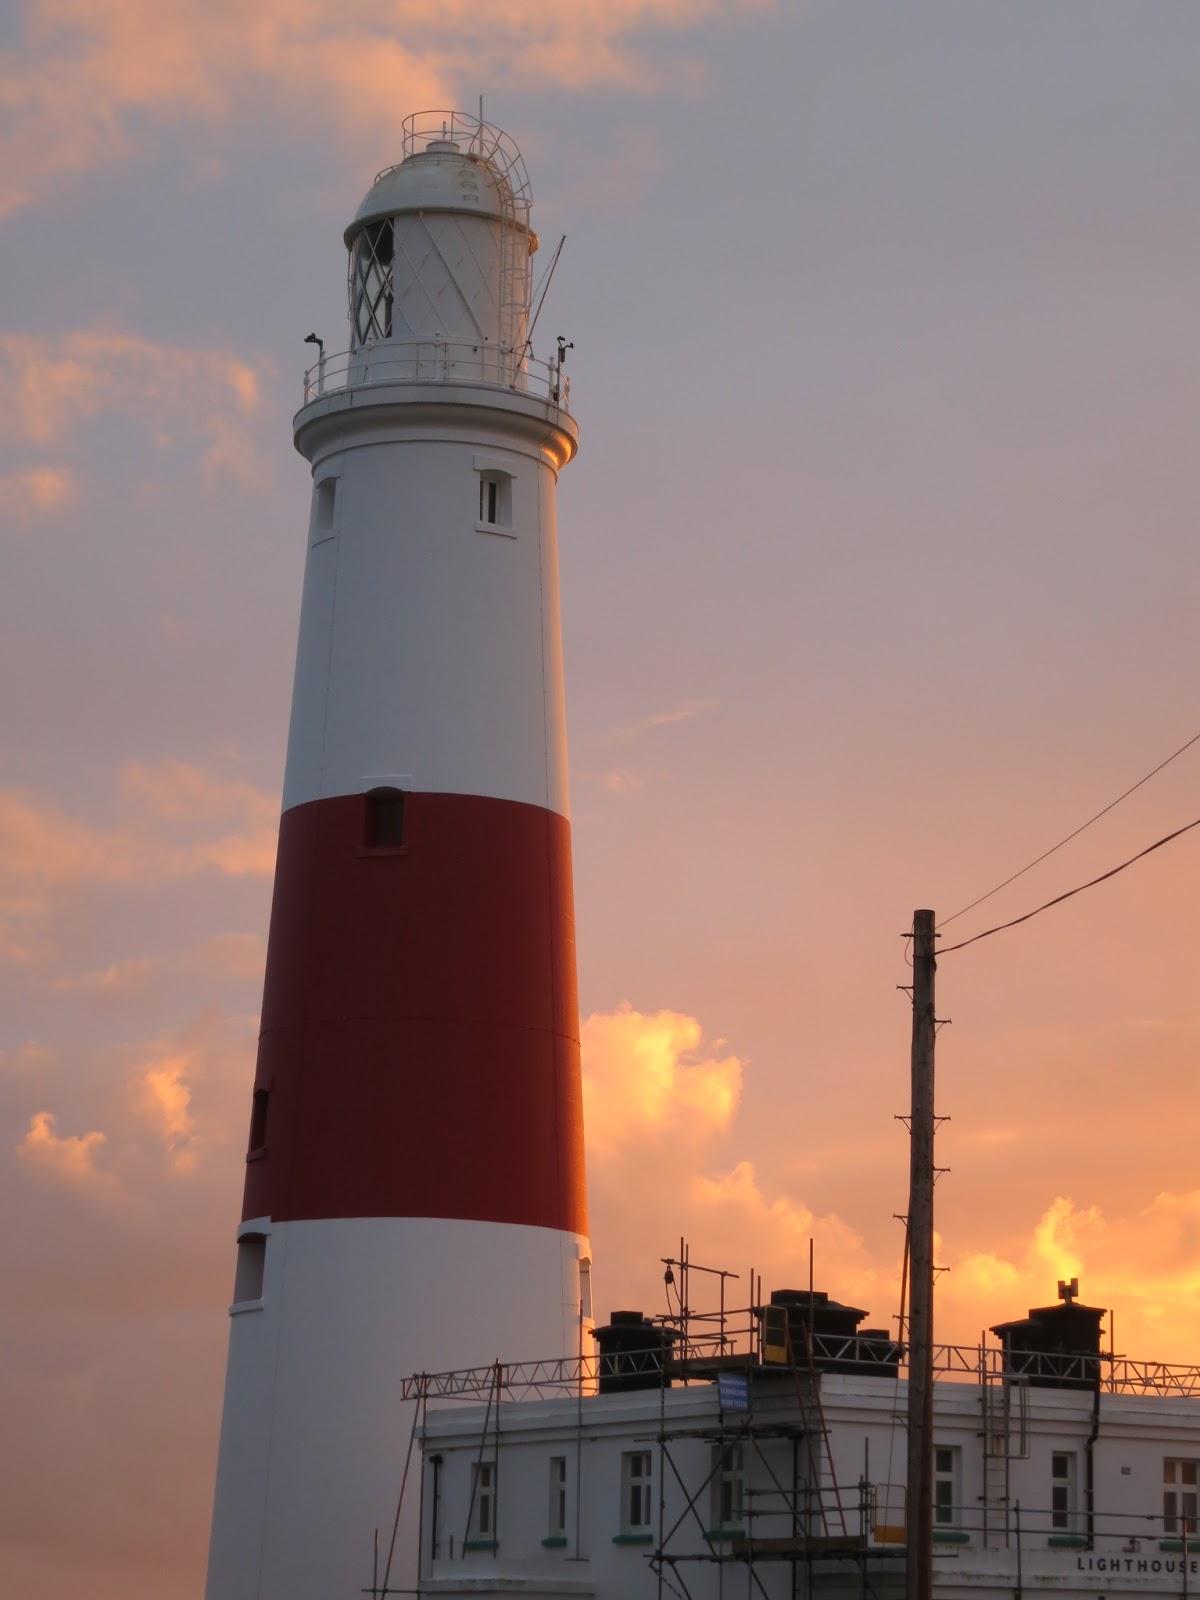 Portland Bill Lighthouse against sugar almond evening sky.